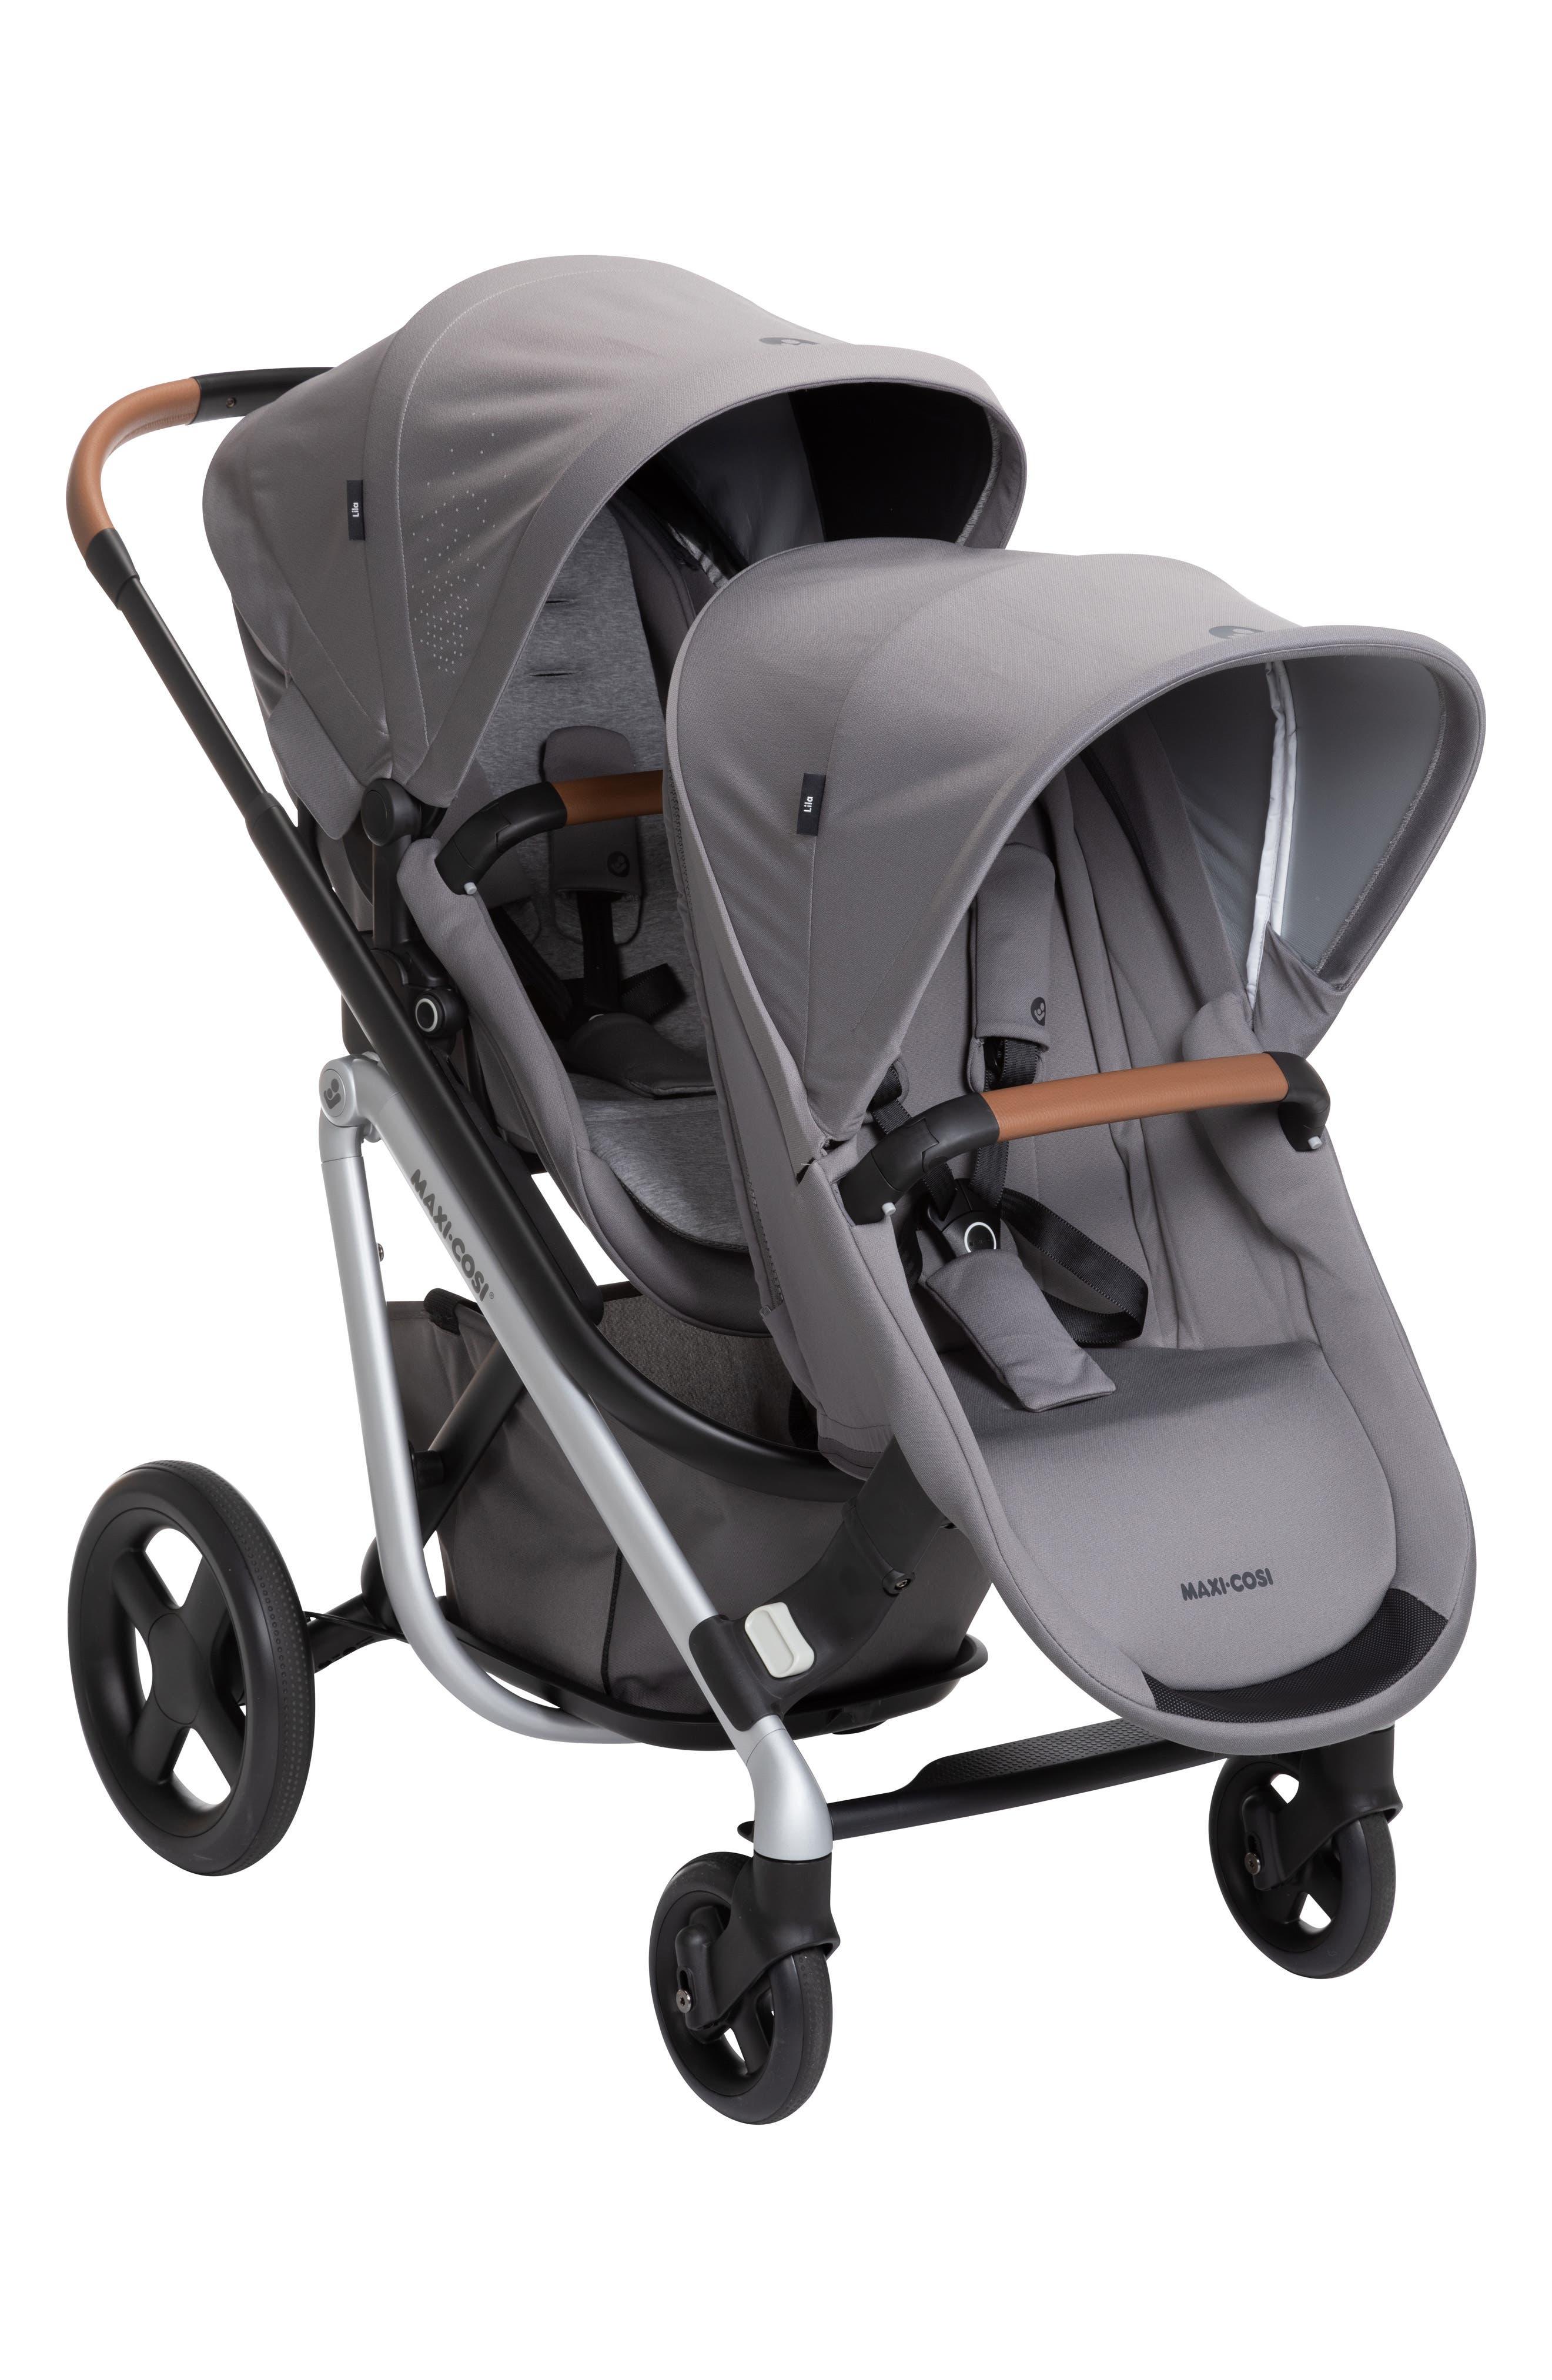 Infant MaxiCosi Lila Duo Sibling Seat Kit Size One Size  Grey